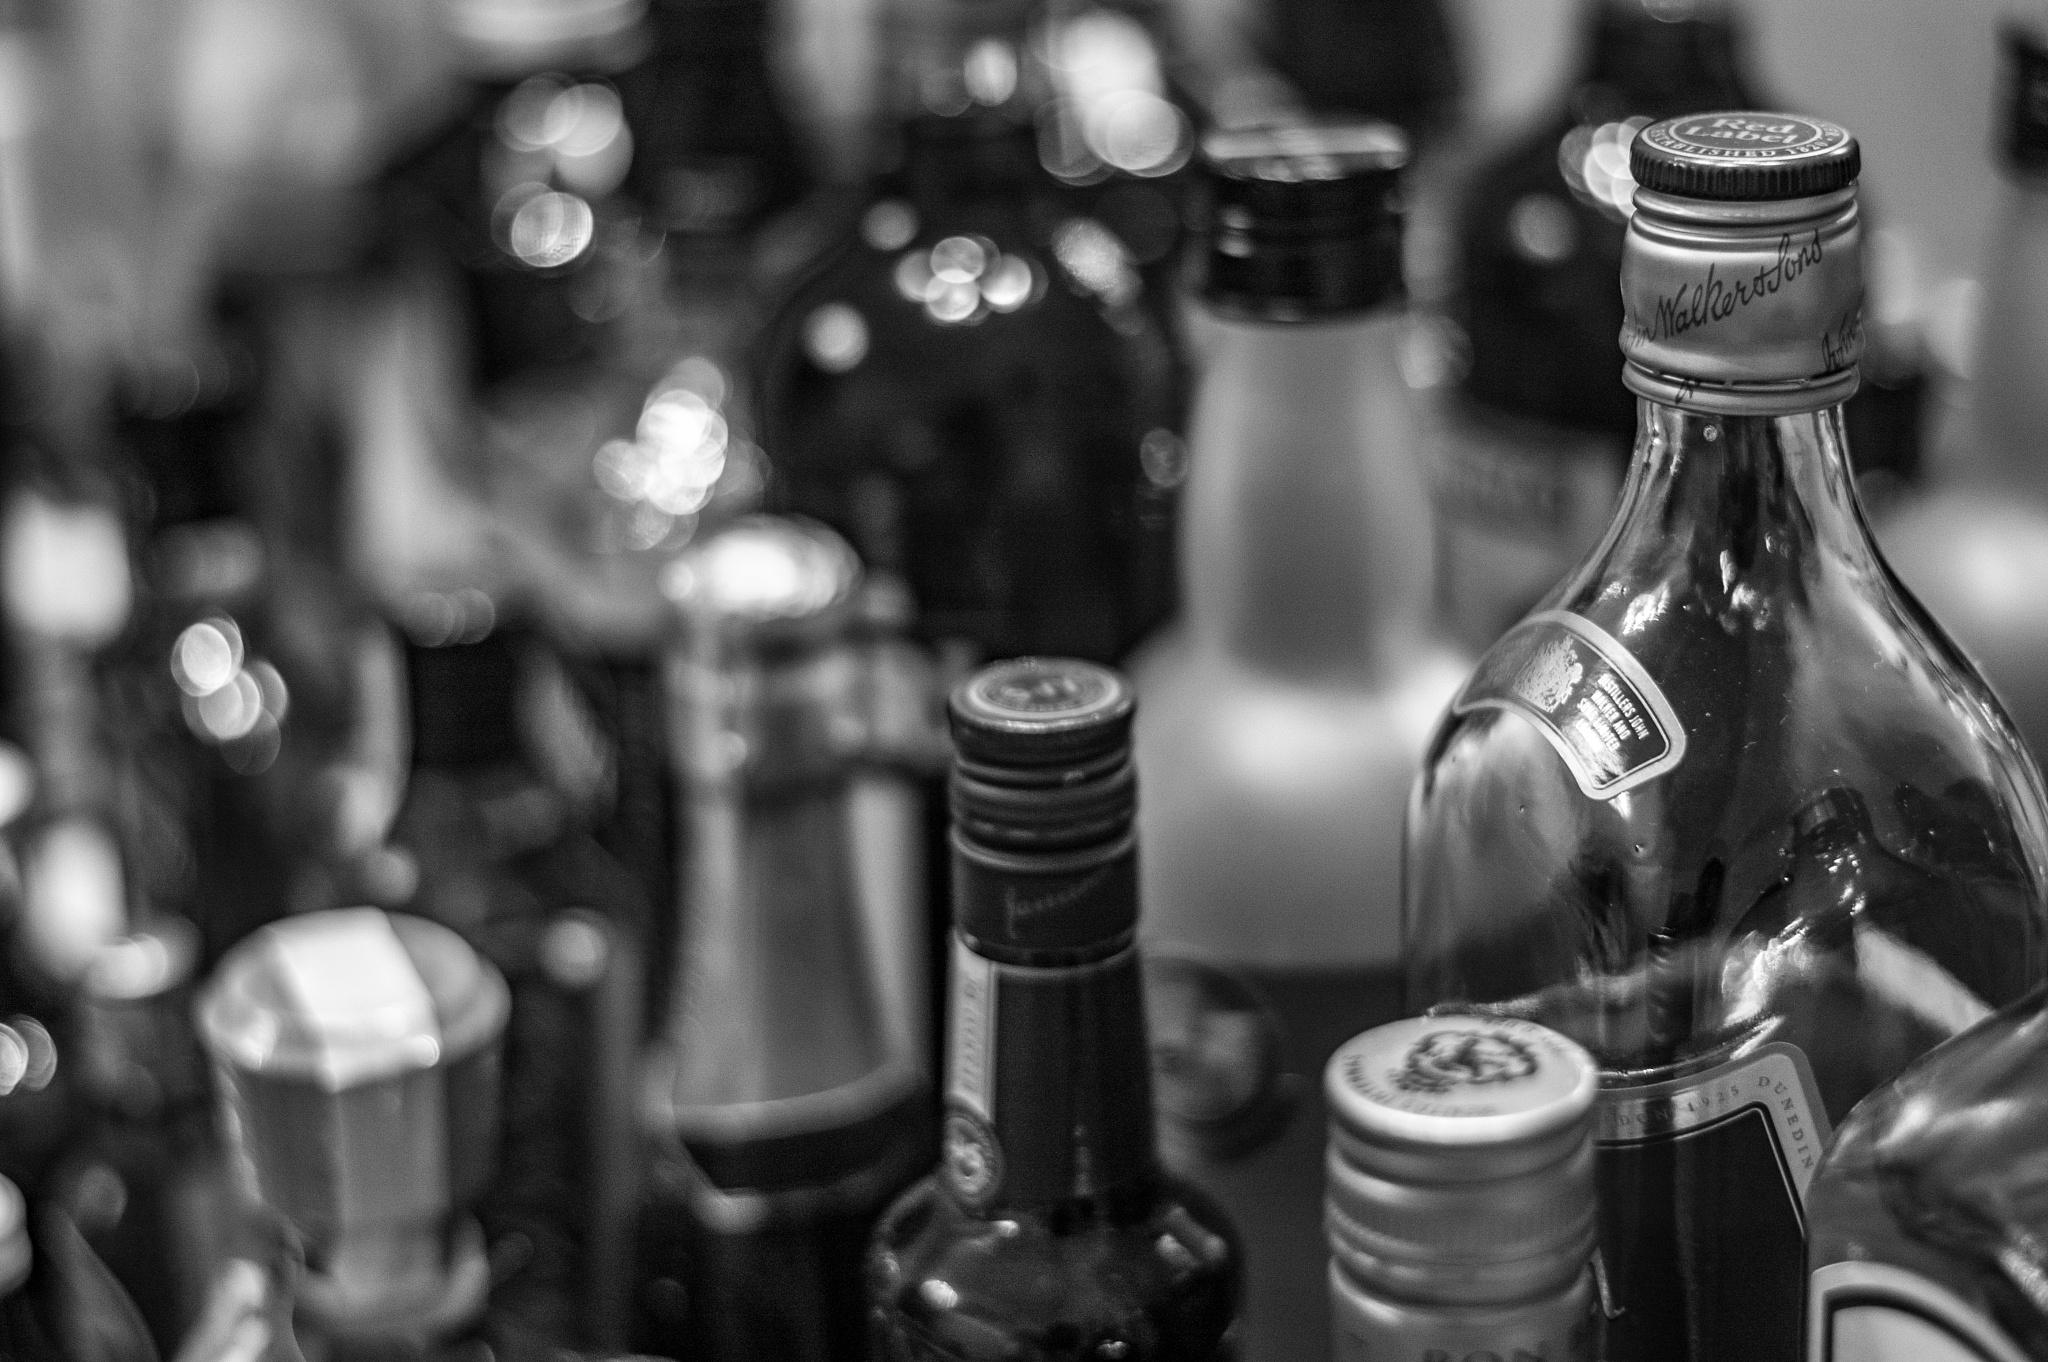 whiskey drinks in black and white by Leonardo Paleari